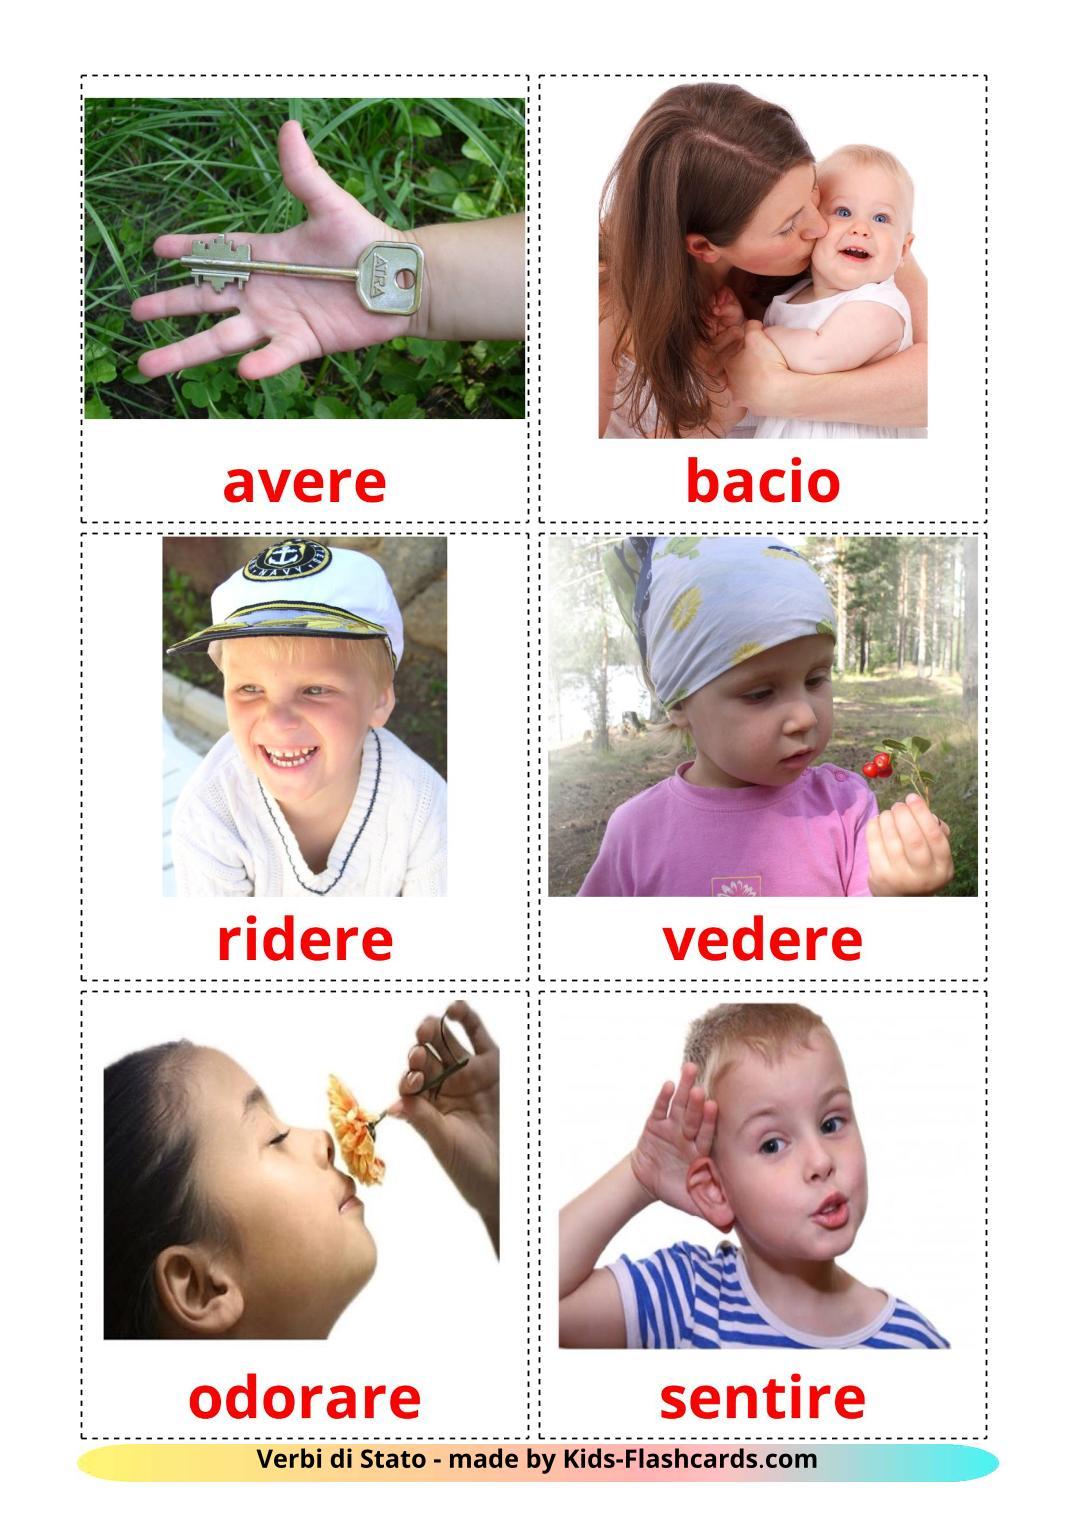 State verbs - 23 Free Printable italian Flashcards